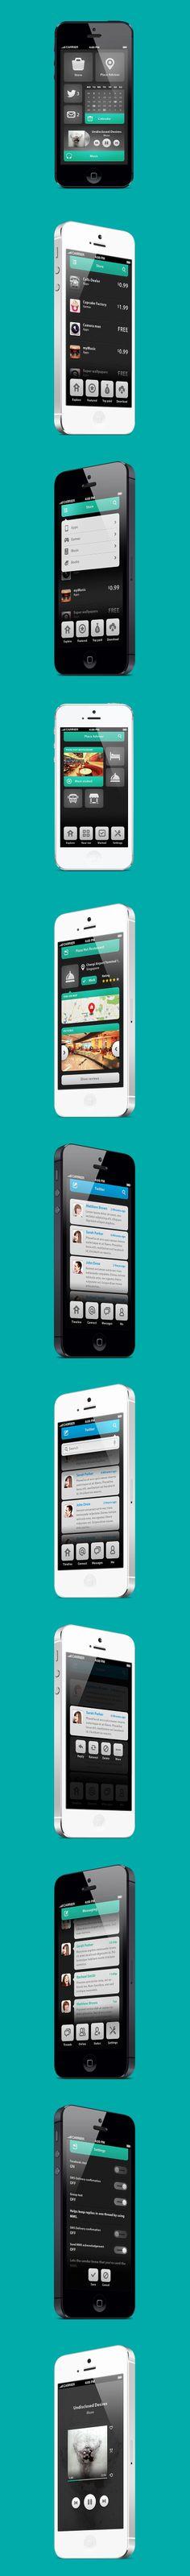 Phone UI Retina – Natalie